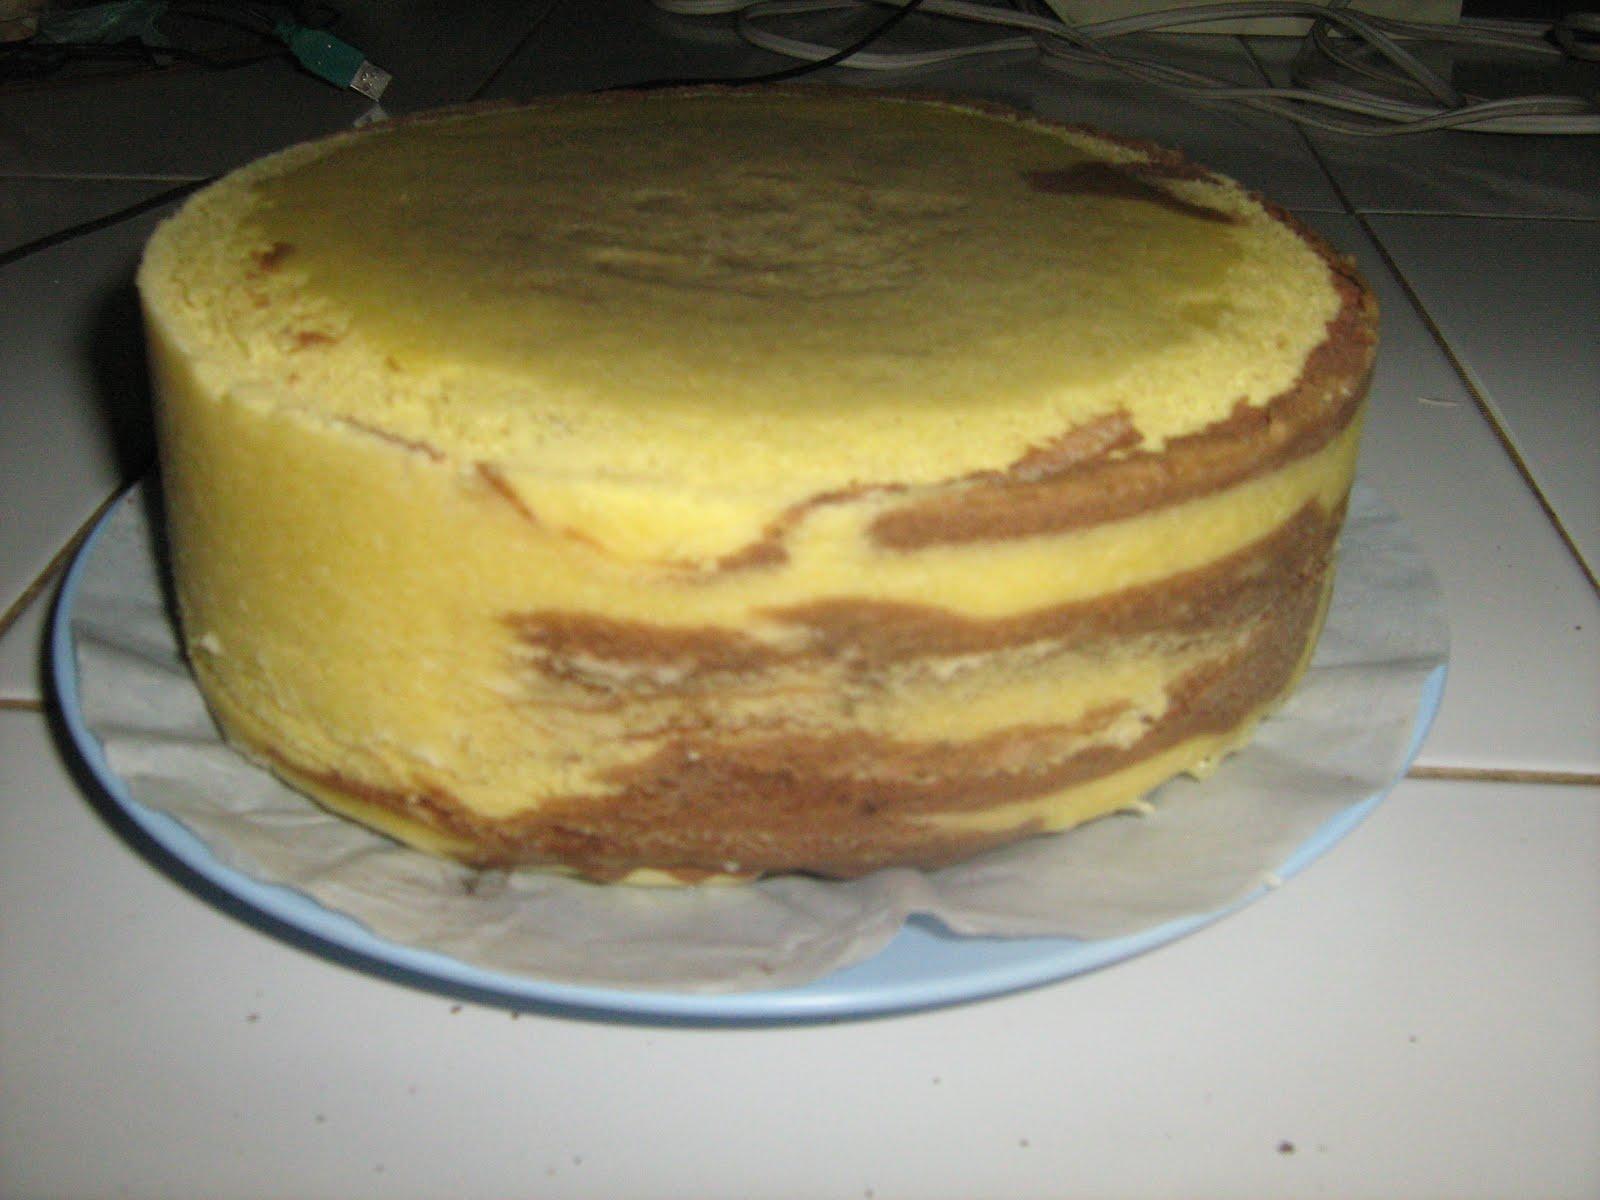 Resep Cake Coklat Kukus Ncc: Buku Resep OchA: Sponge Cake Kukus Pelangi